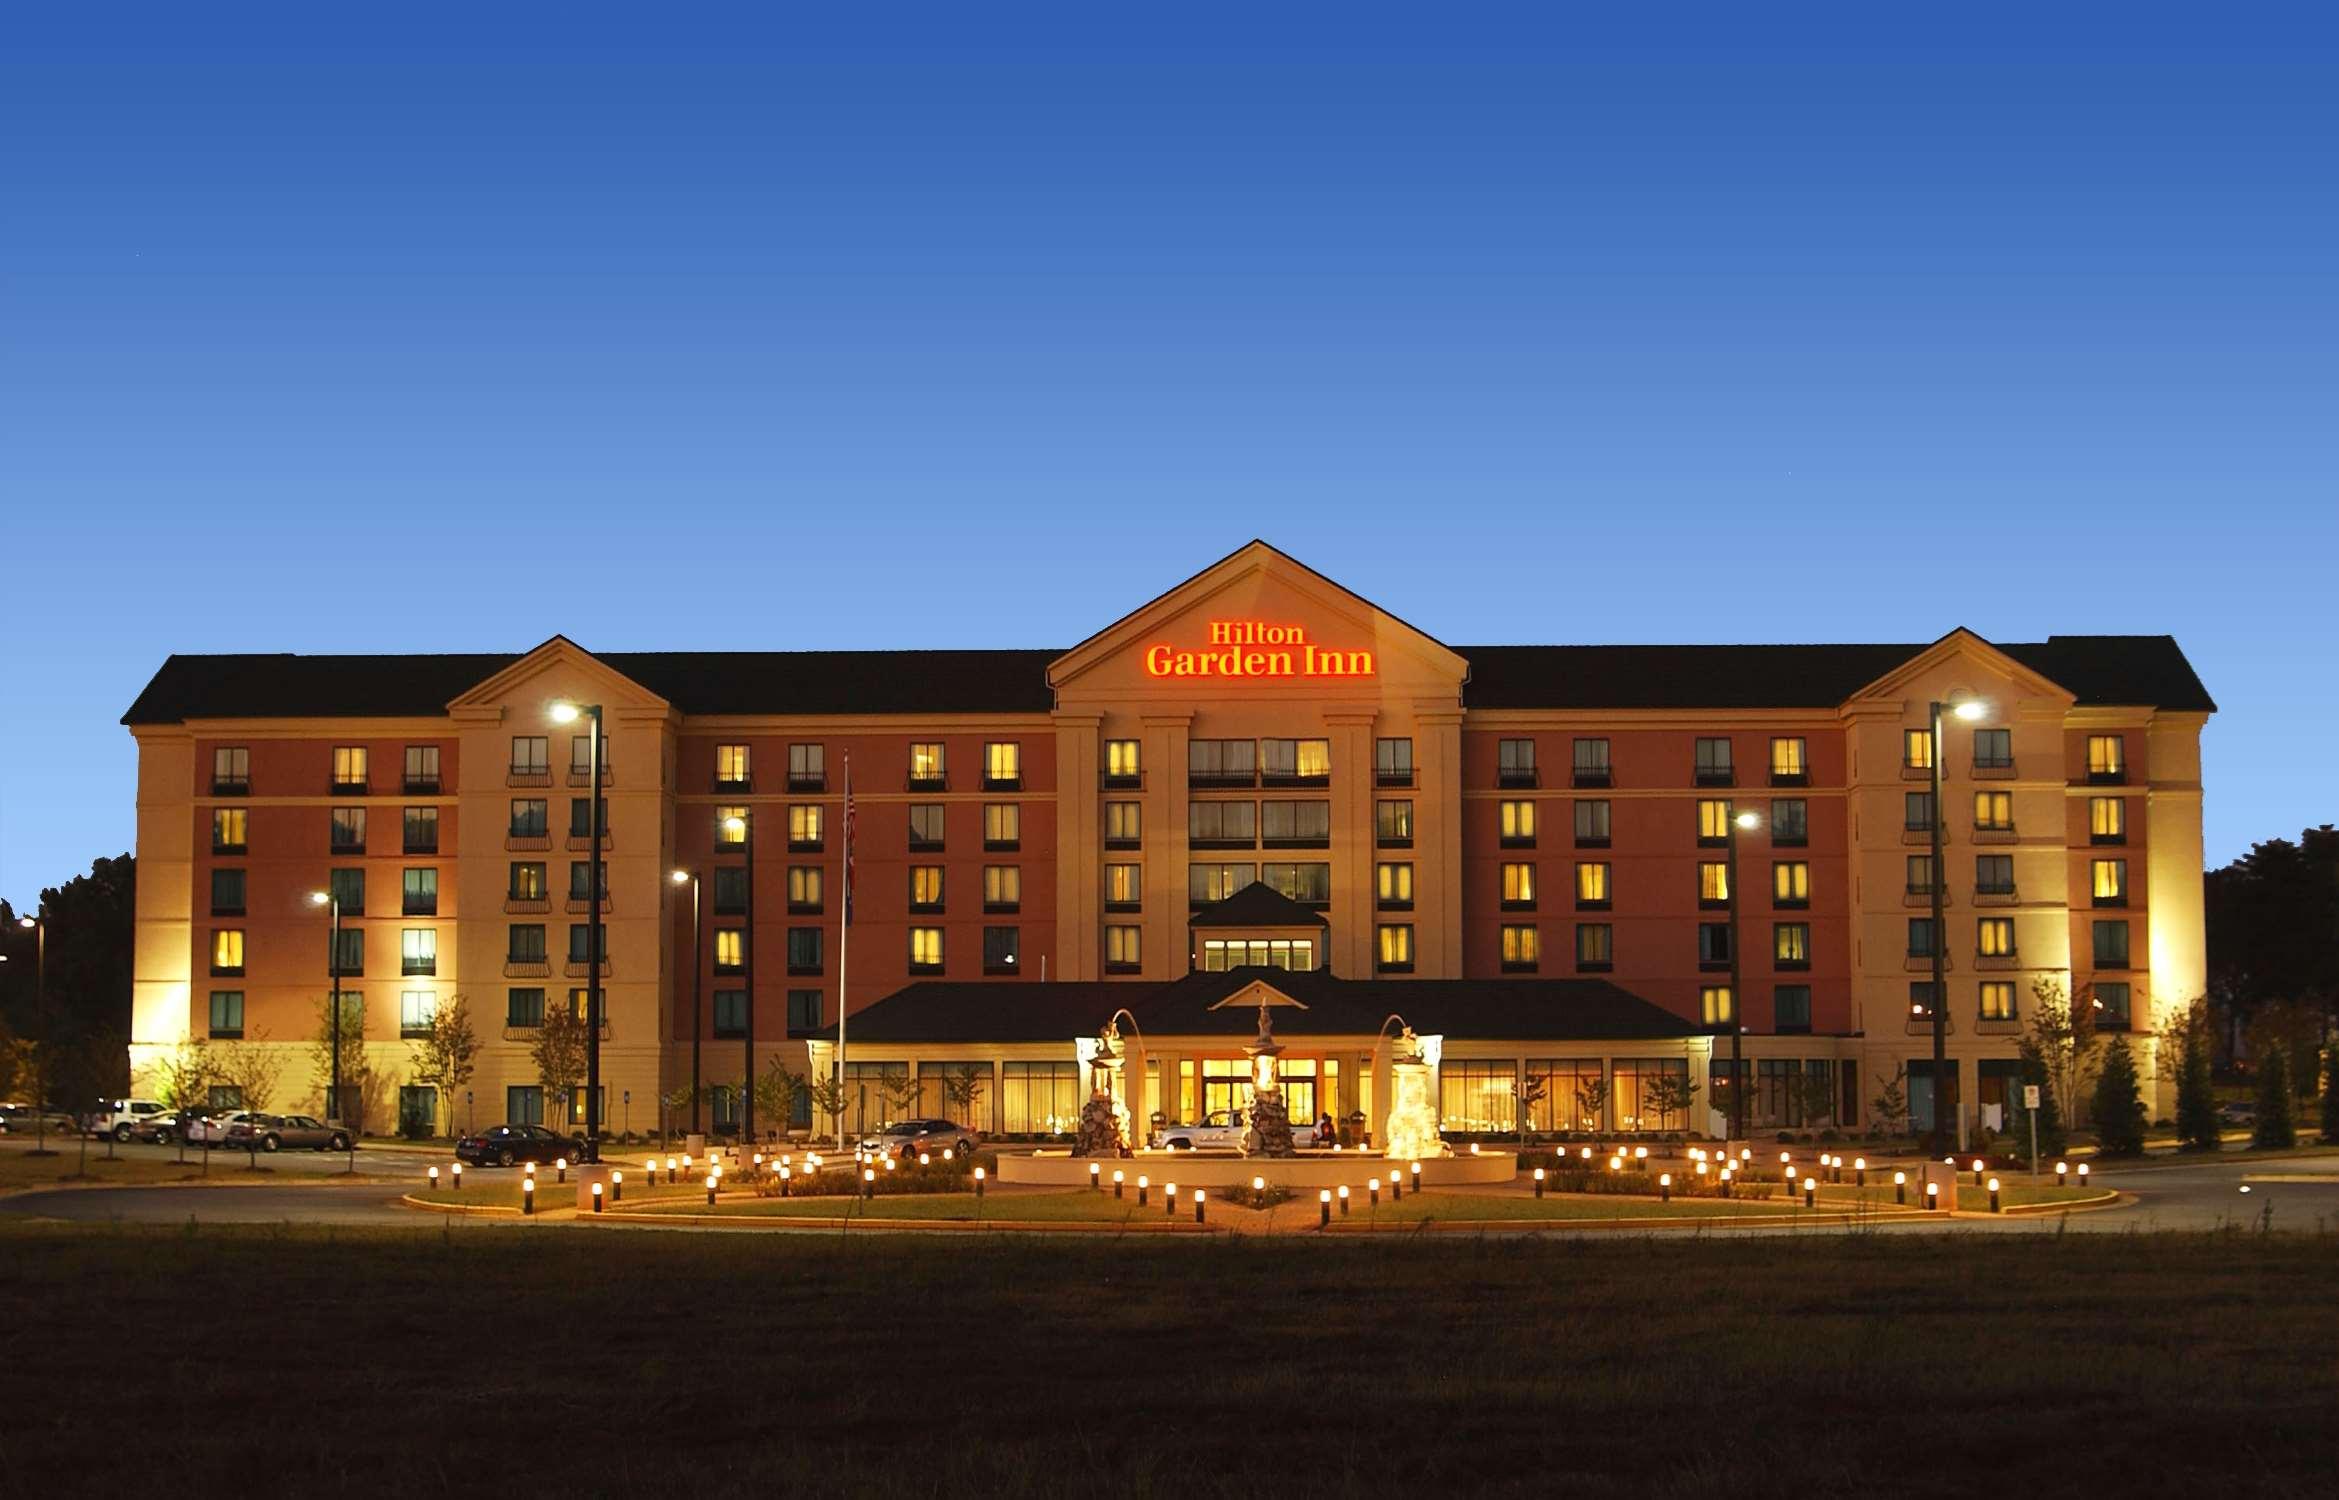 Hilton Garden Inn Atlanta Airport/Millenium Center image 1